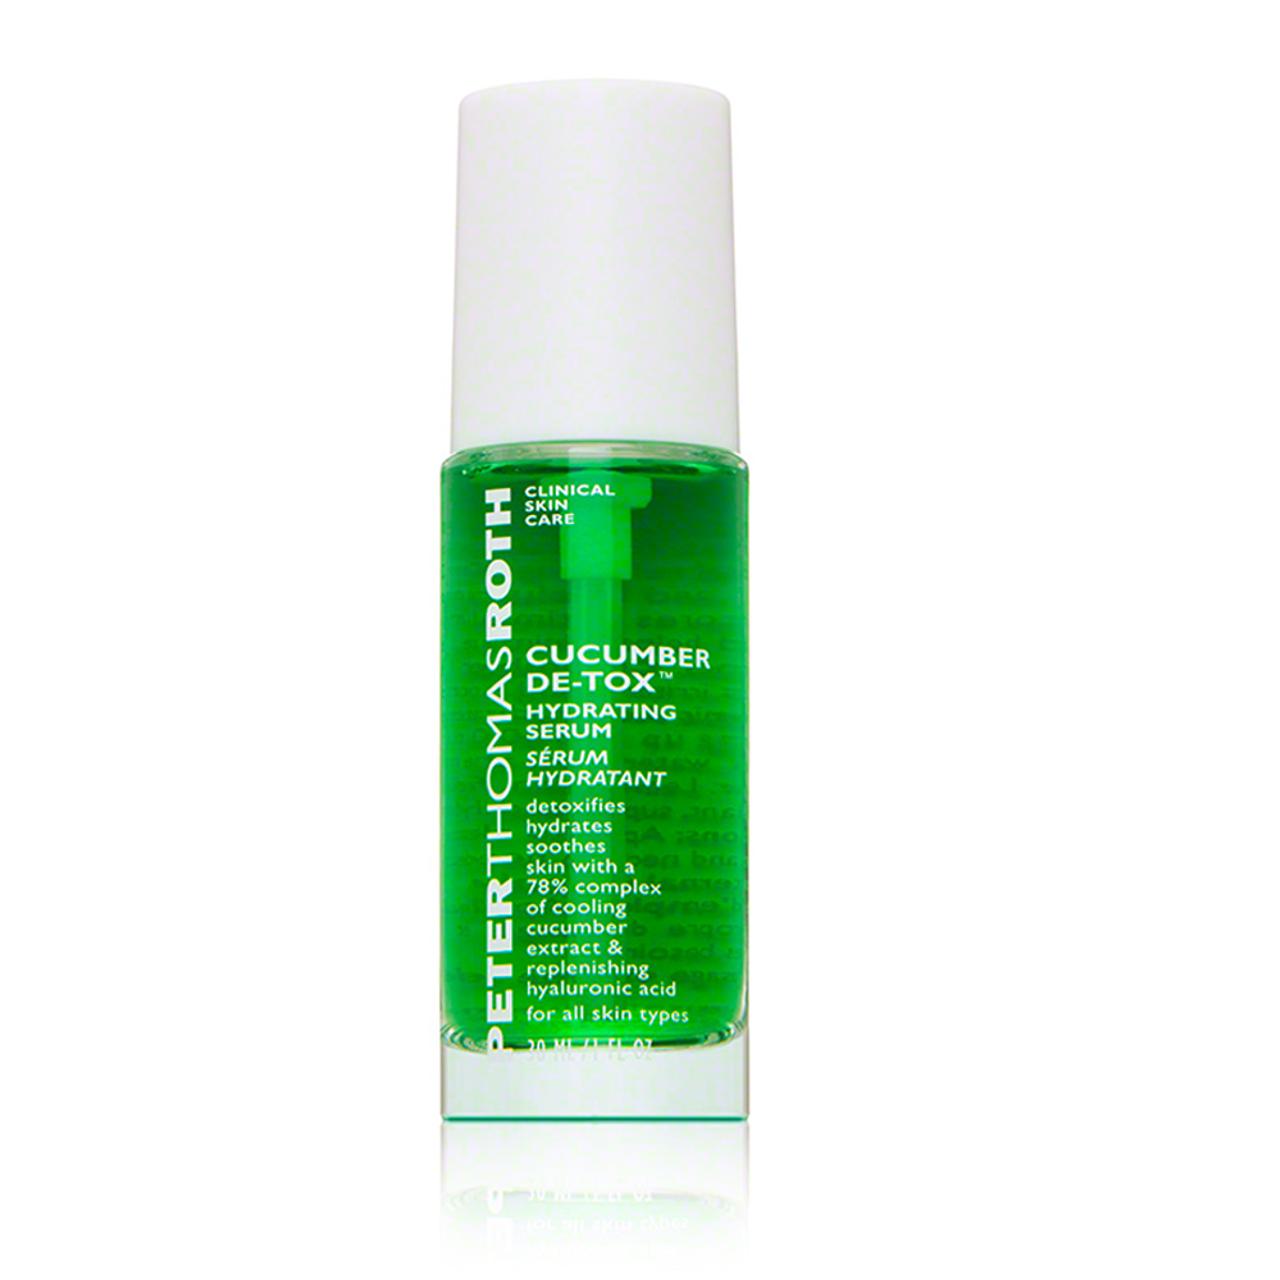 Peter Thomas Roth Cucumber De-Tox Hydrating Serum